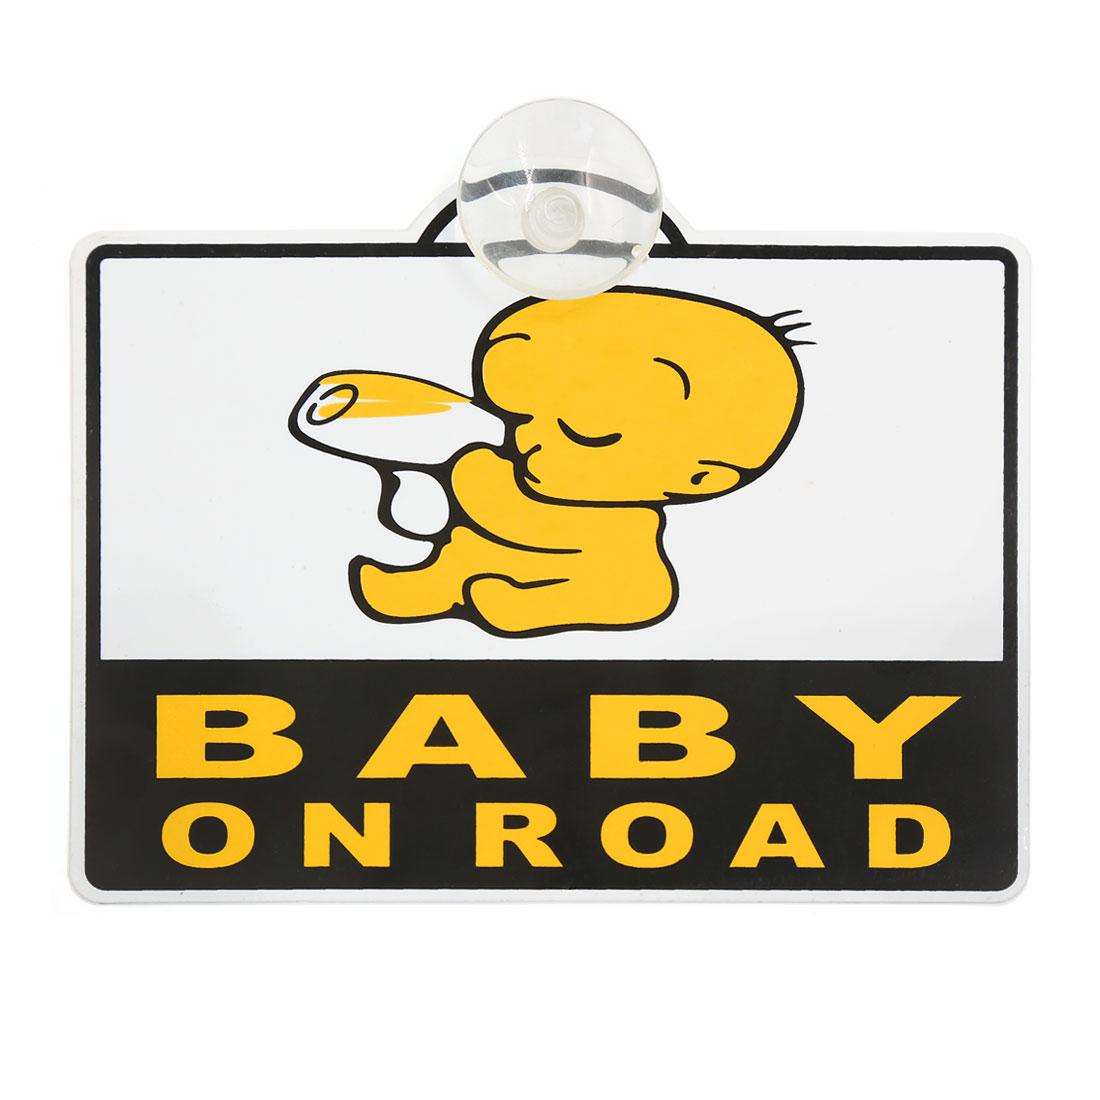 BABY ON BOARD Car SUV Body Windscreen Safety Sticker Decals w Sucker